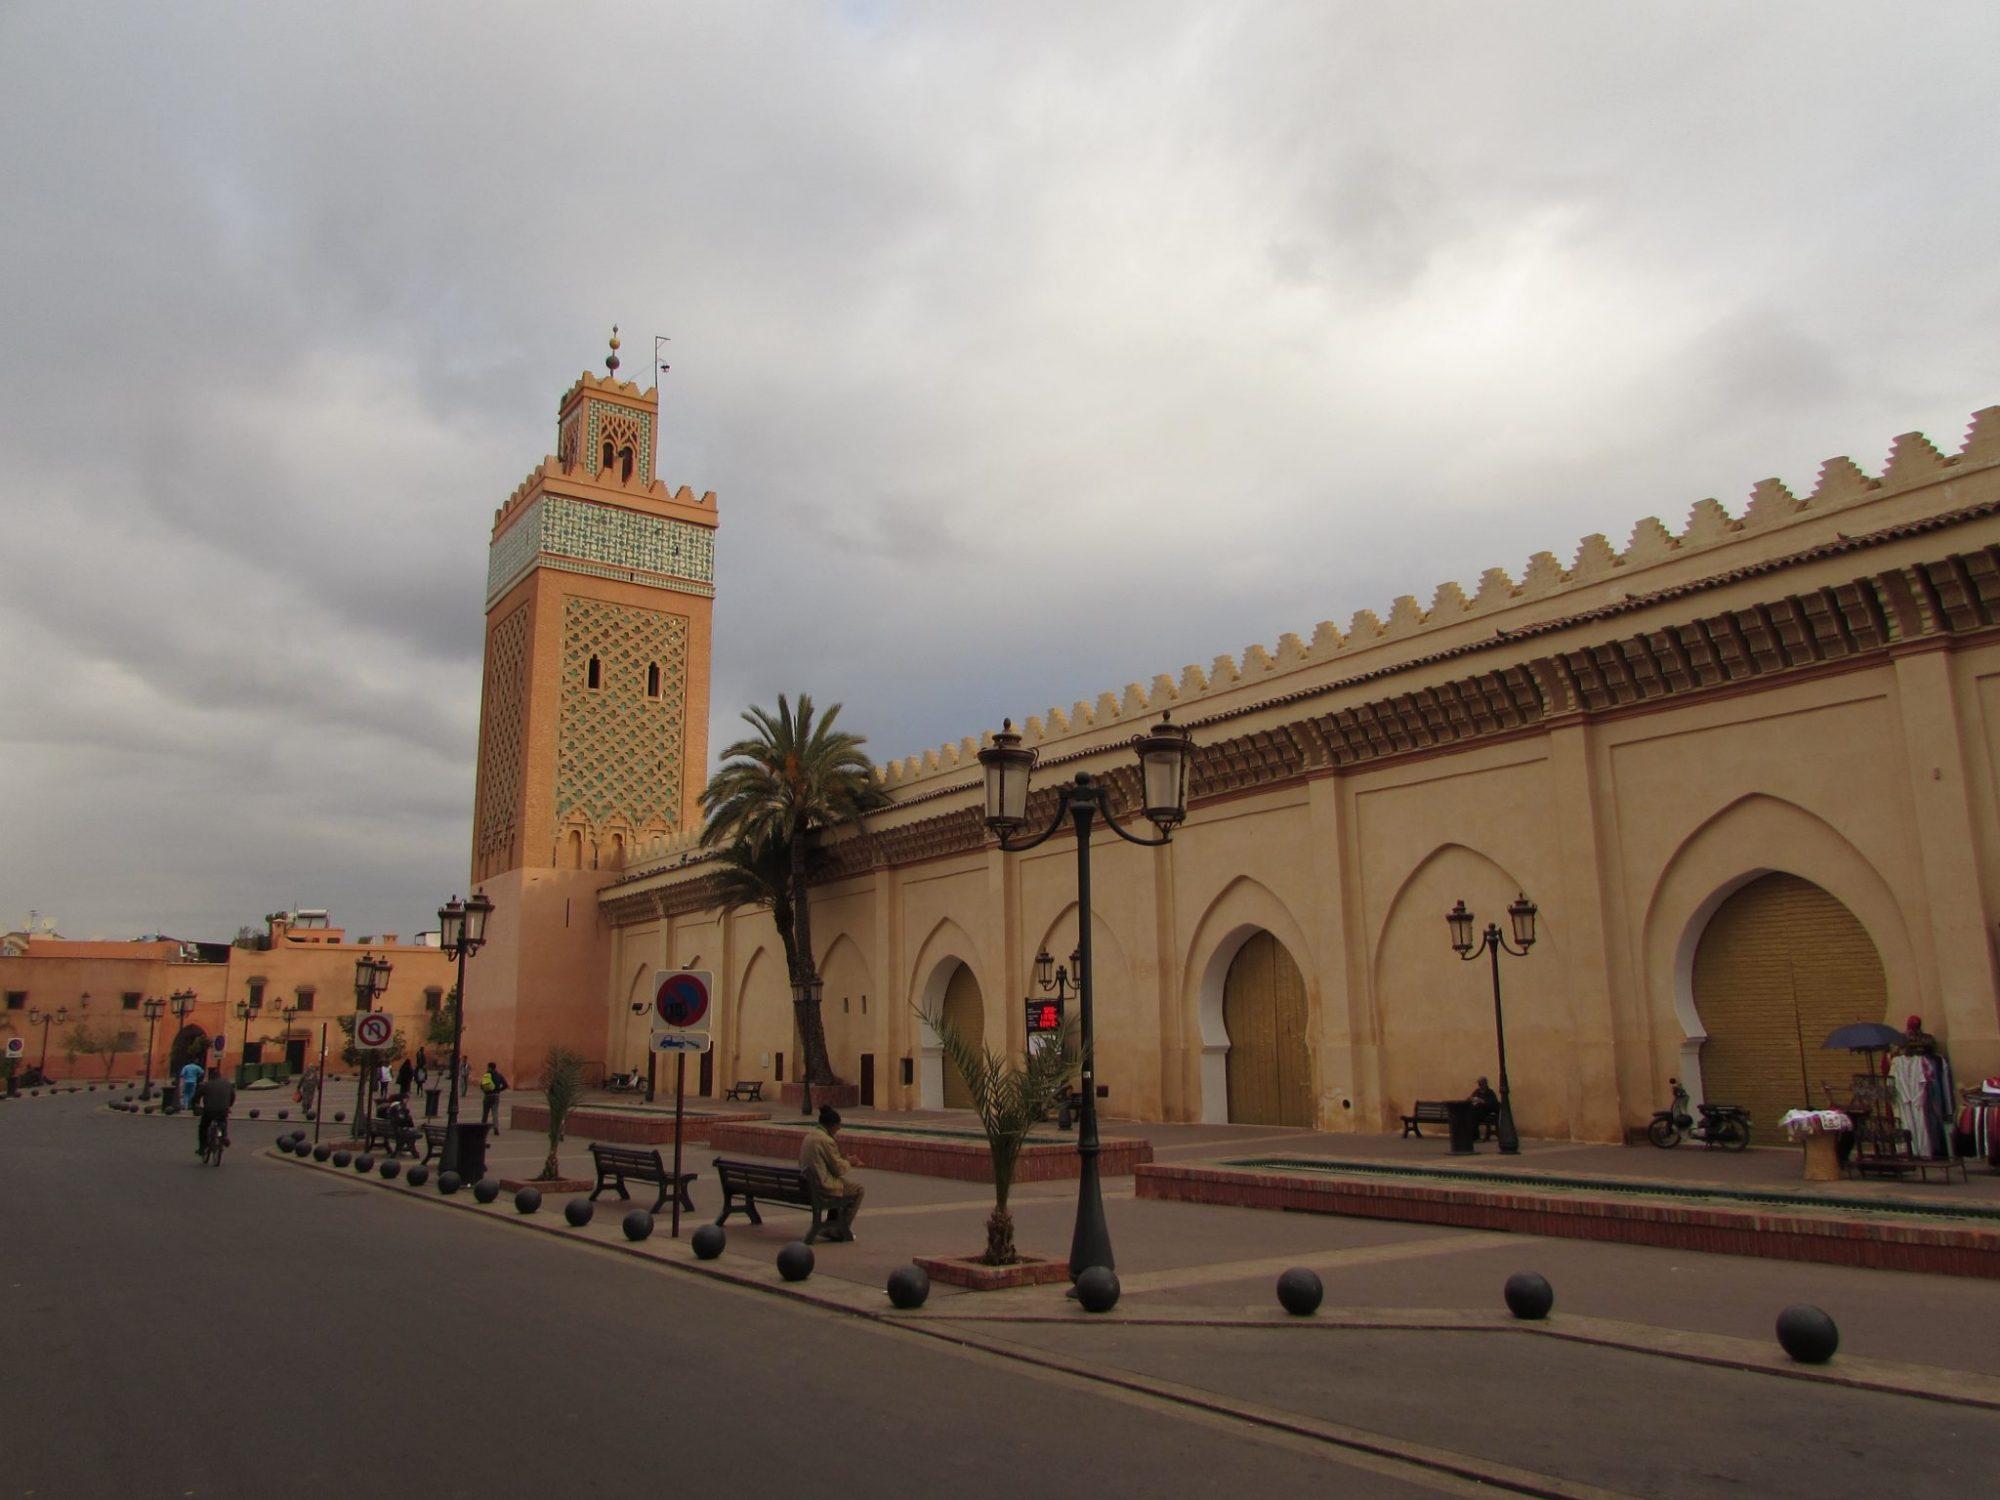 Mezquita Moulay el Yacid